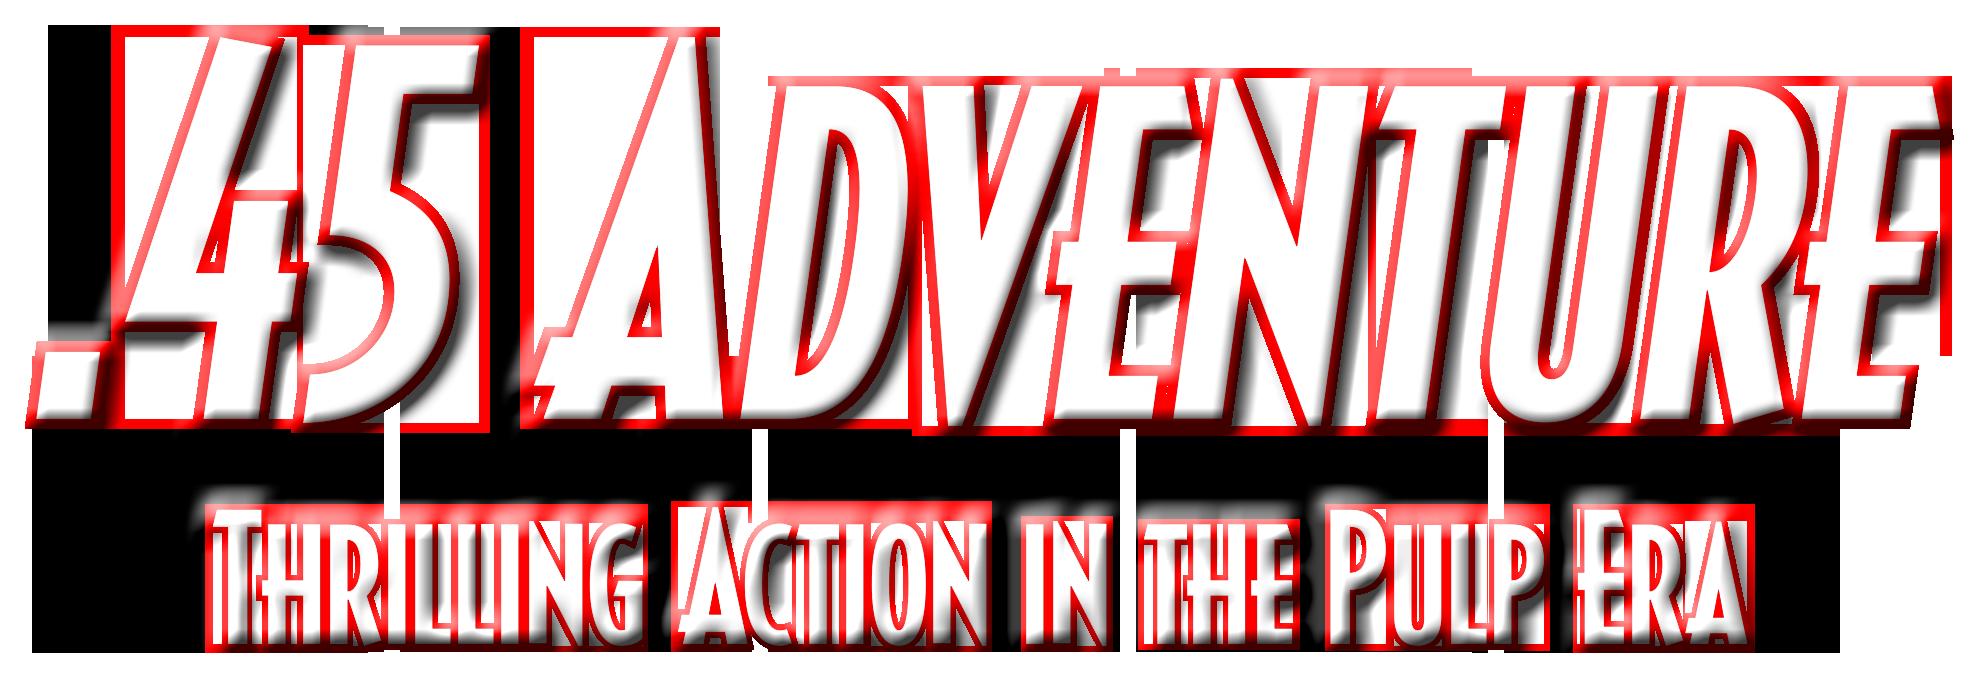 .45 Adventure